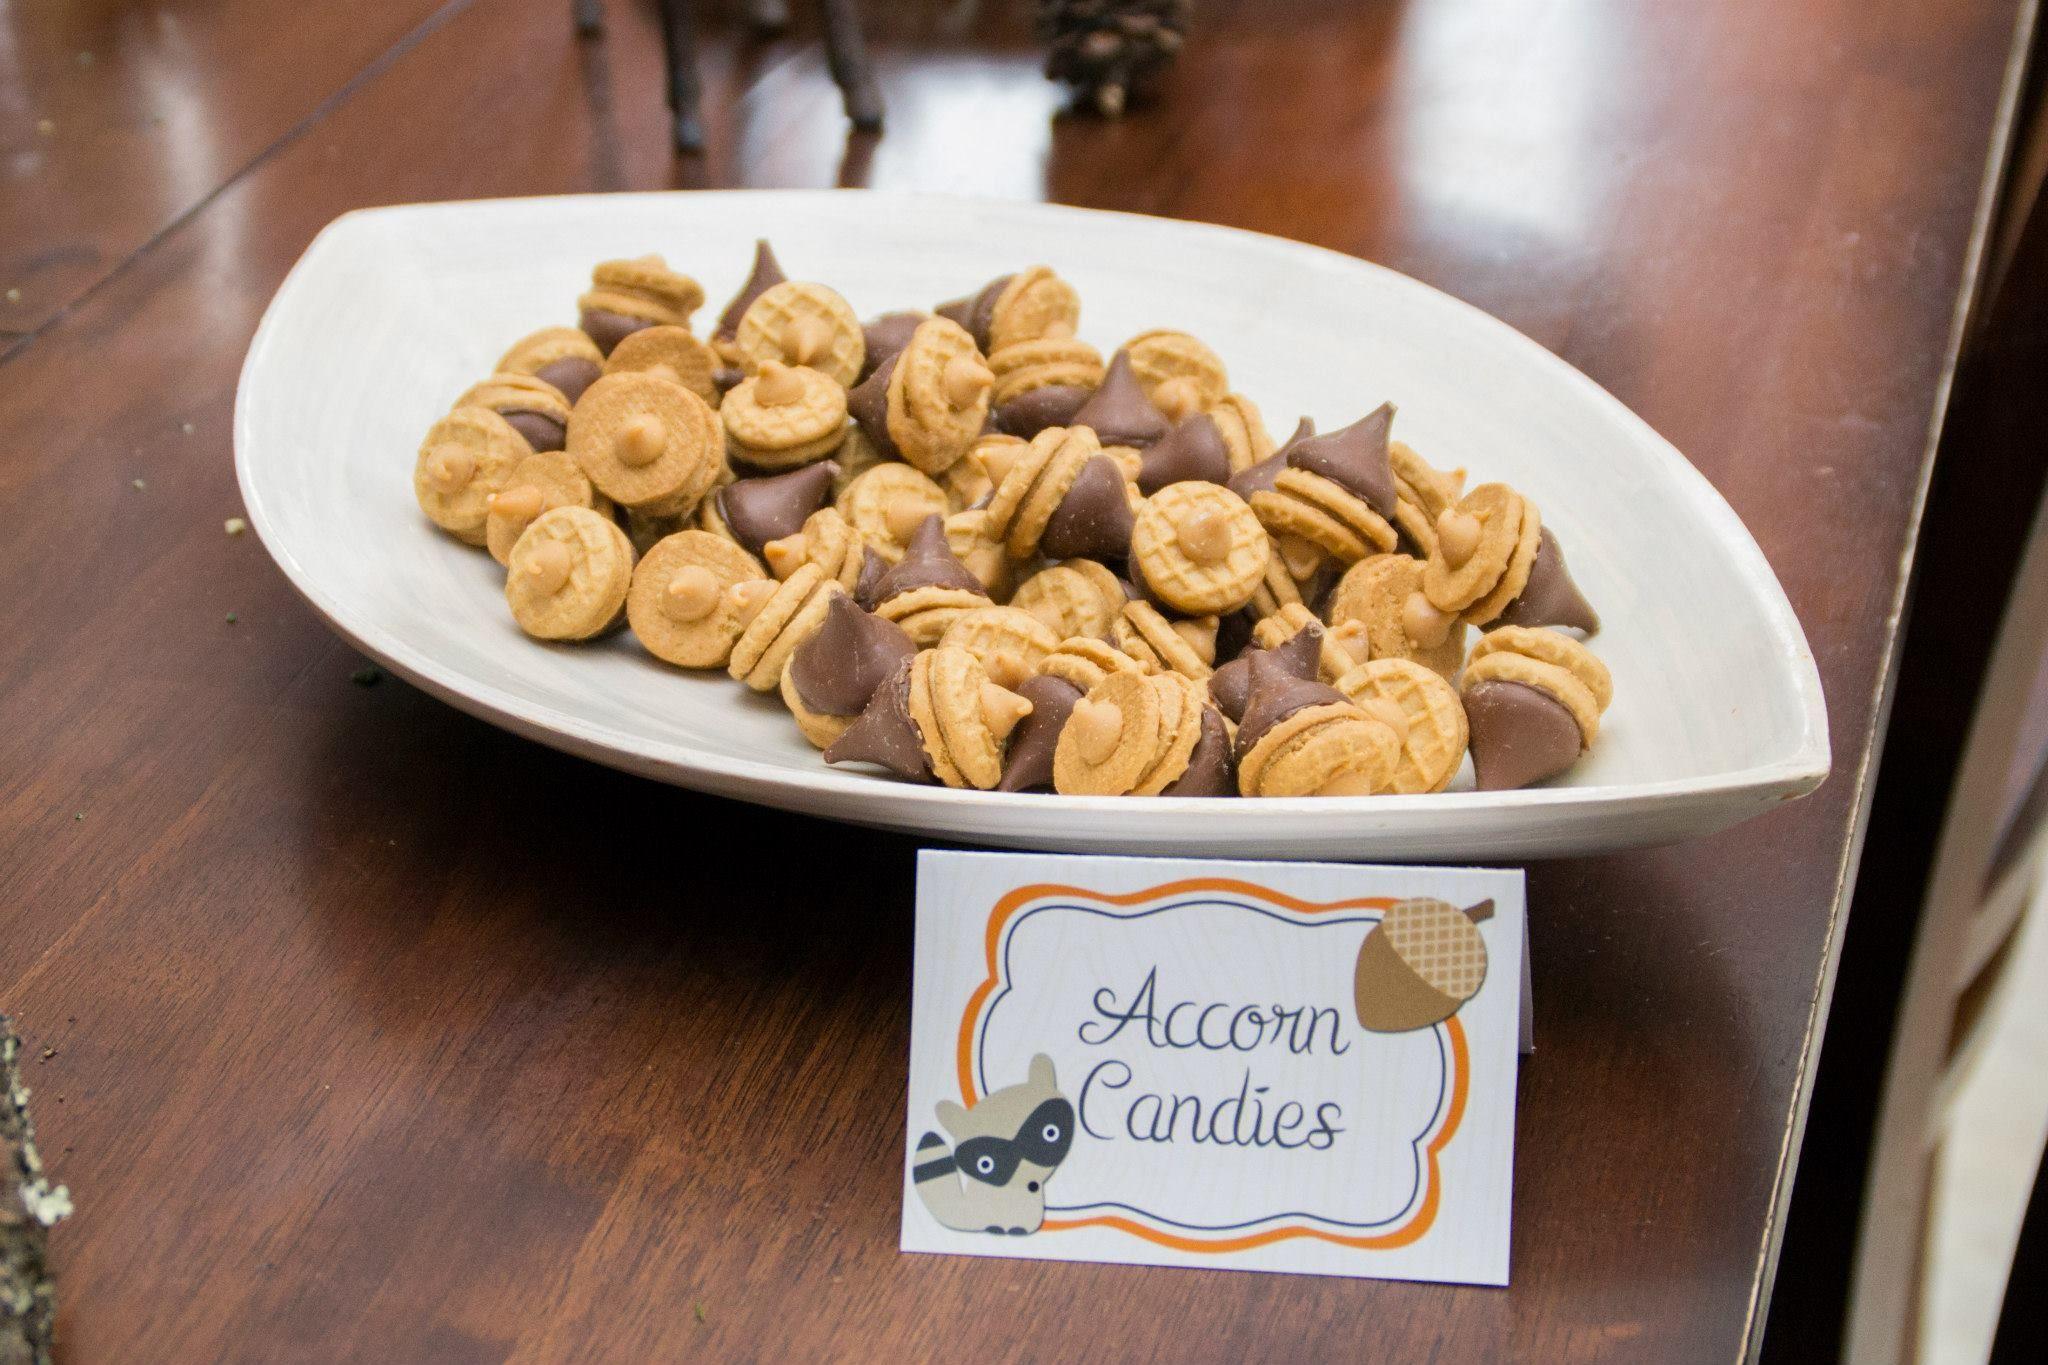 Woodland Baby Shower + Fall Food Ideas A Hershey kiss + a ...